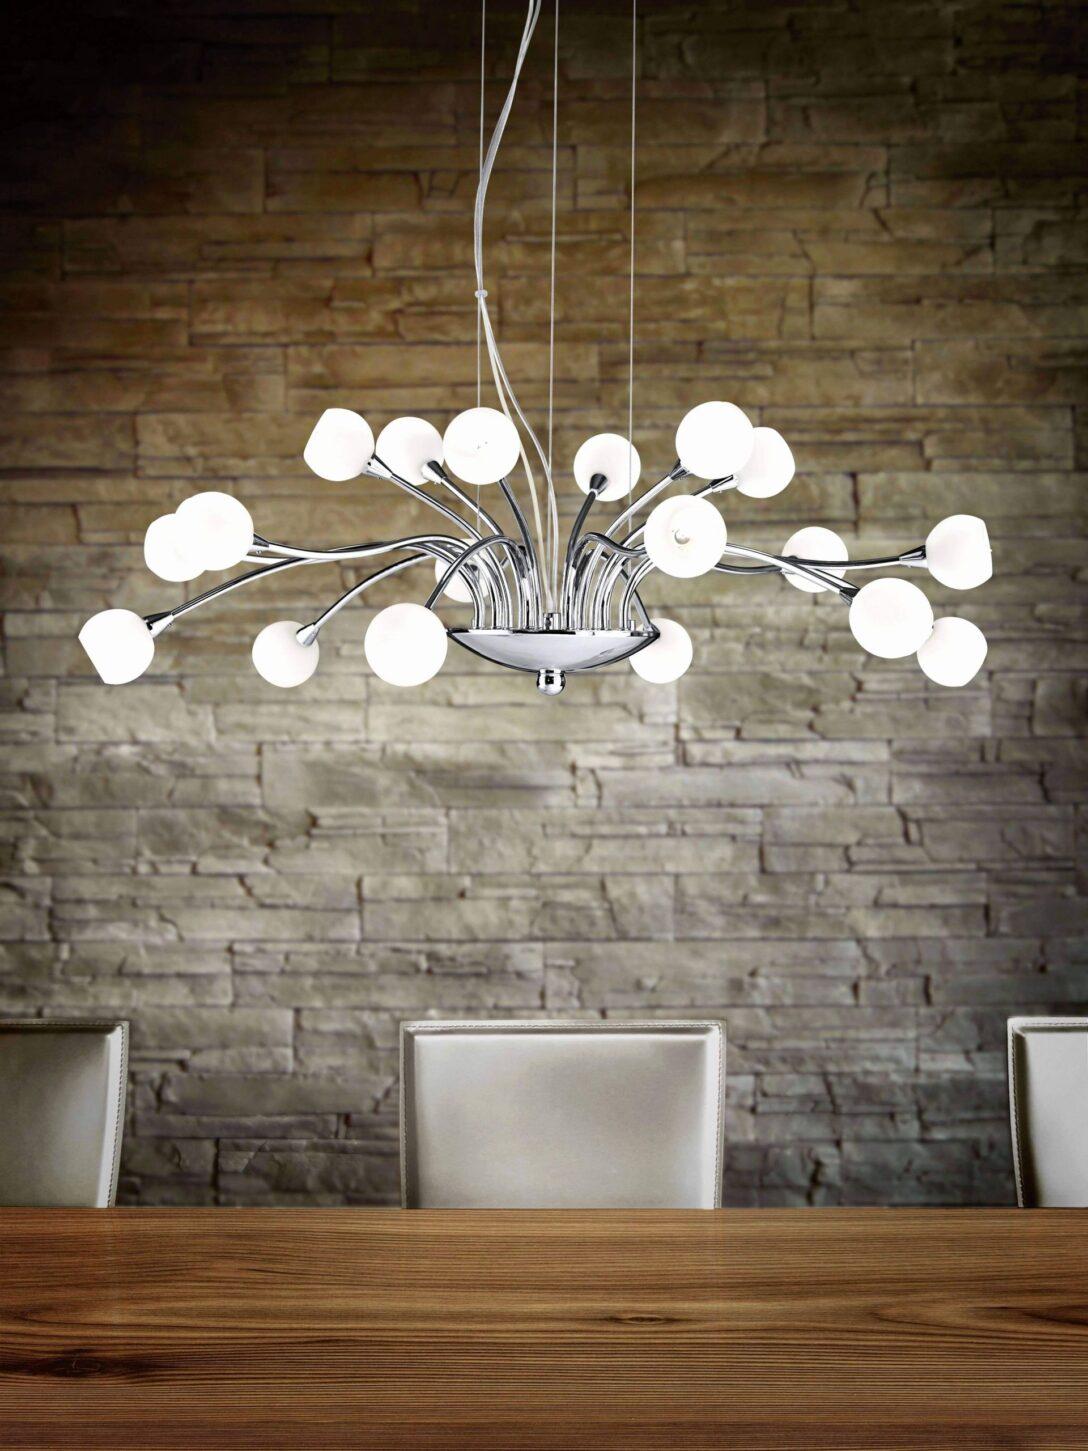 Large Size of Lampe Modern Ventilateur Plafond Moderne Pour Salon Ikea A Poser Sur Pied De Design Meuble 29 Einzigartig Wohnzimmer Elegant Frisch Deckenlampe Bad Wohnzimmer Lampe Modern